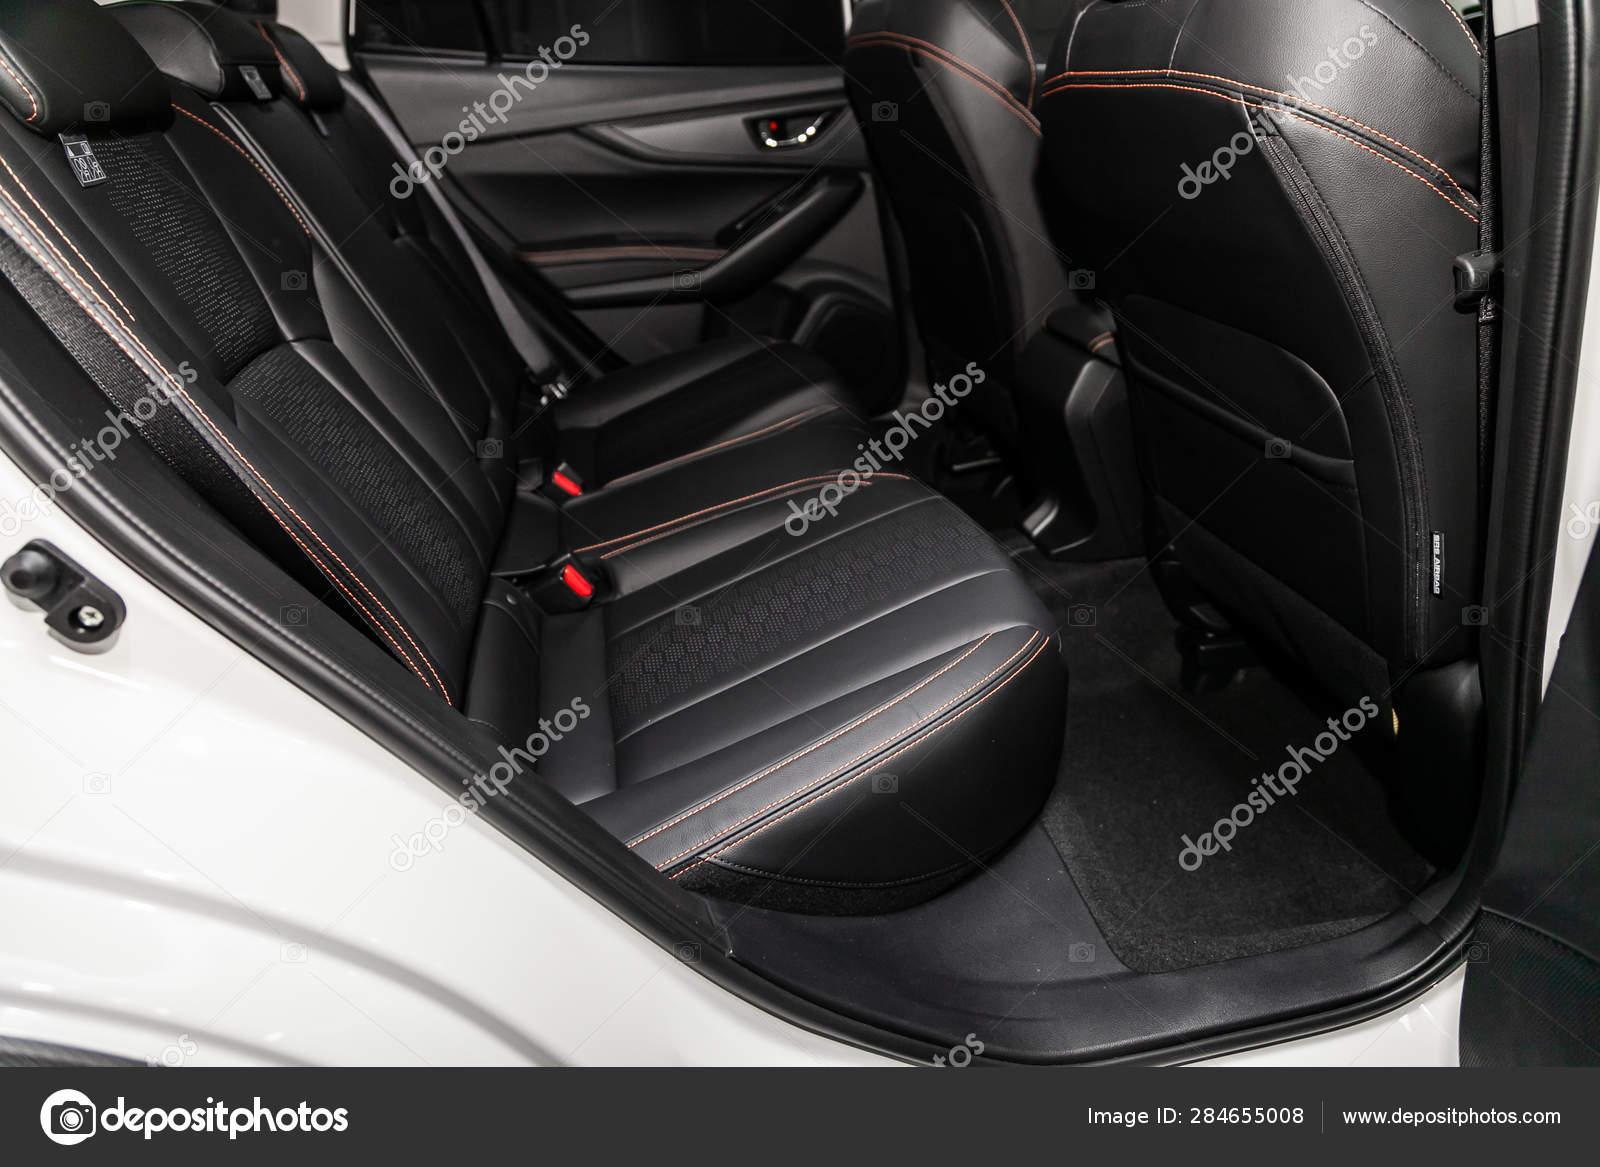 Peachy Novosibirsk Russia June 2019 Subaru Close Black Rear Seats Ibusinesslaw Wood Chair Design Ideas Ibusinesslaworg